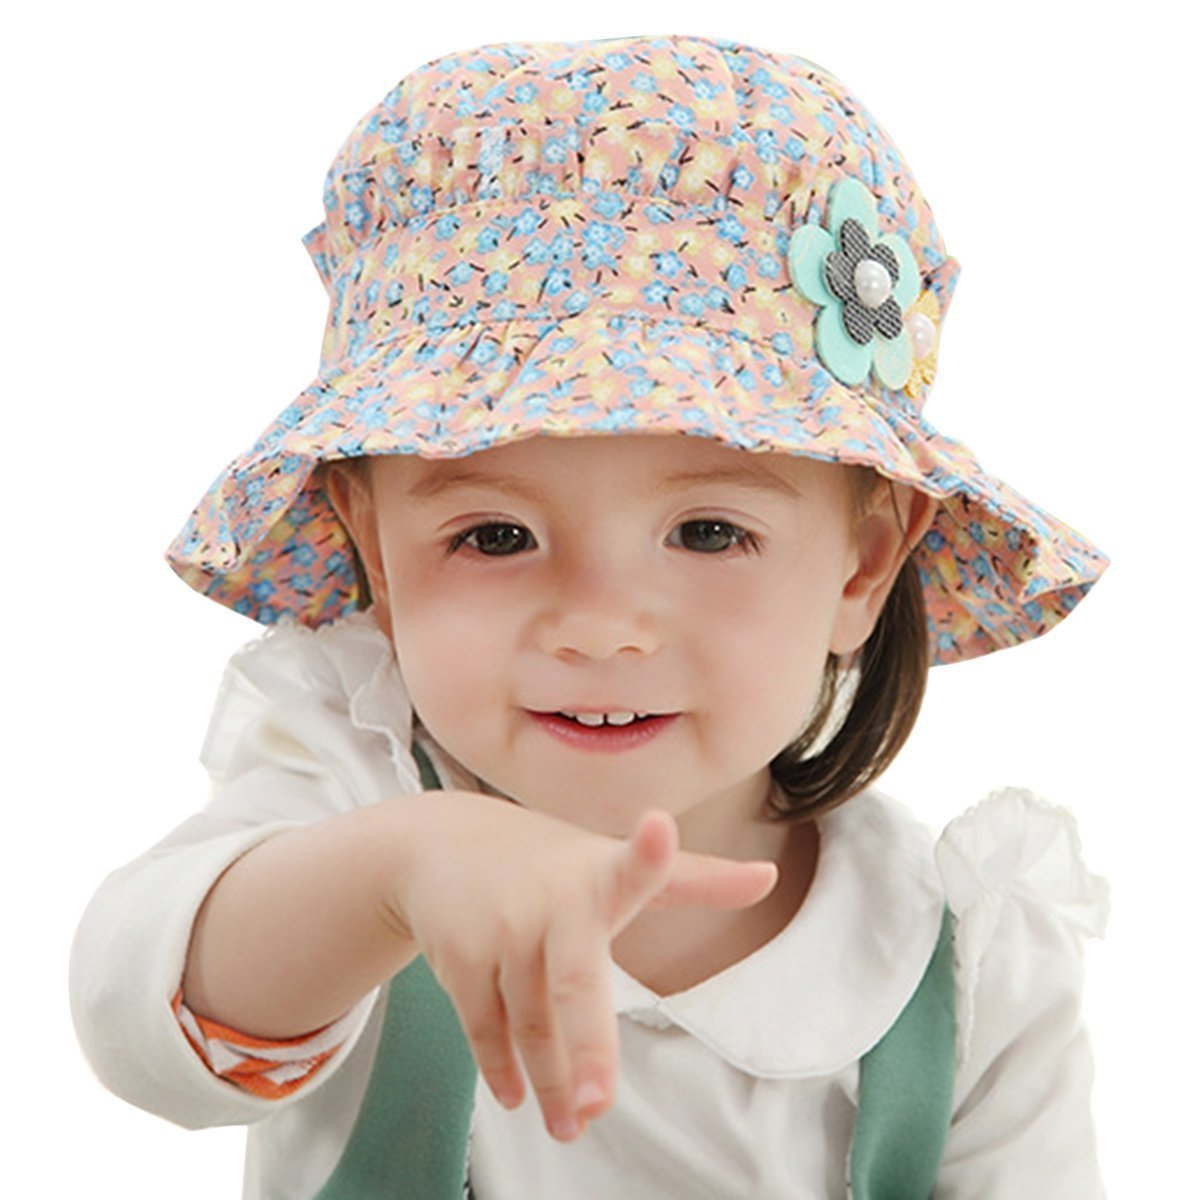 d5c4b4c4eaf Butterme Unisex Toddler Children Kids Hawaiian Floral Print Sun Cap Spring  Summer Cotton Fishing Bucket Hat Beach Sunhats for 1-4 Years Baby  (Pink+Blue)  ...